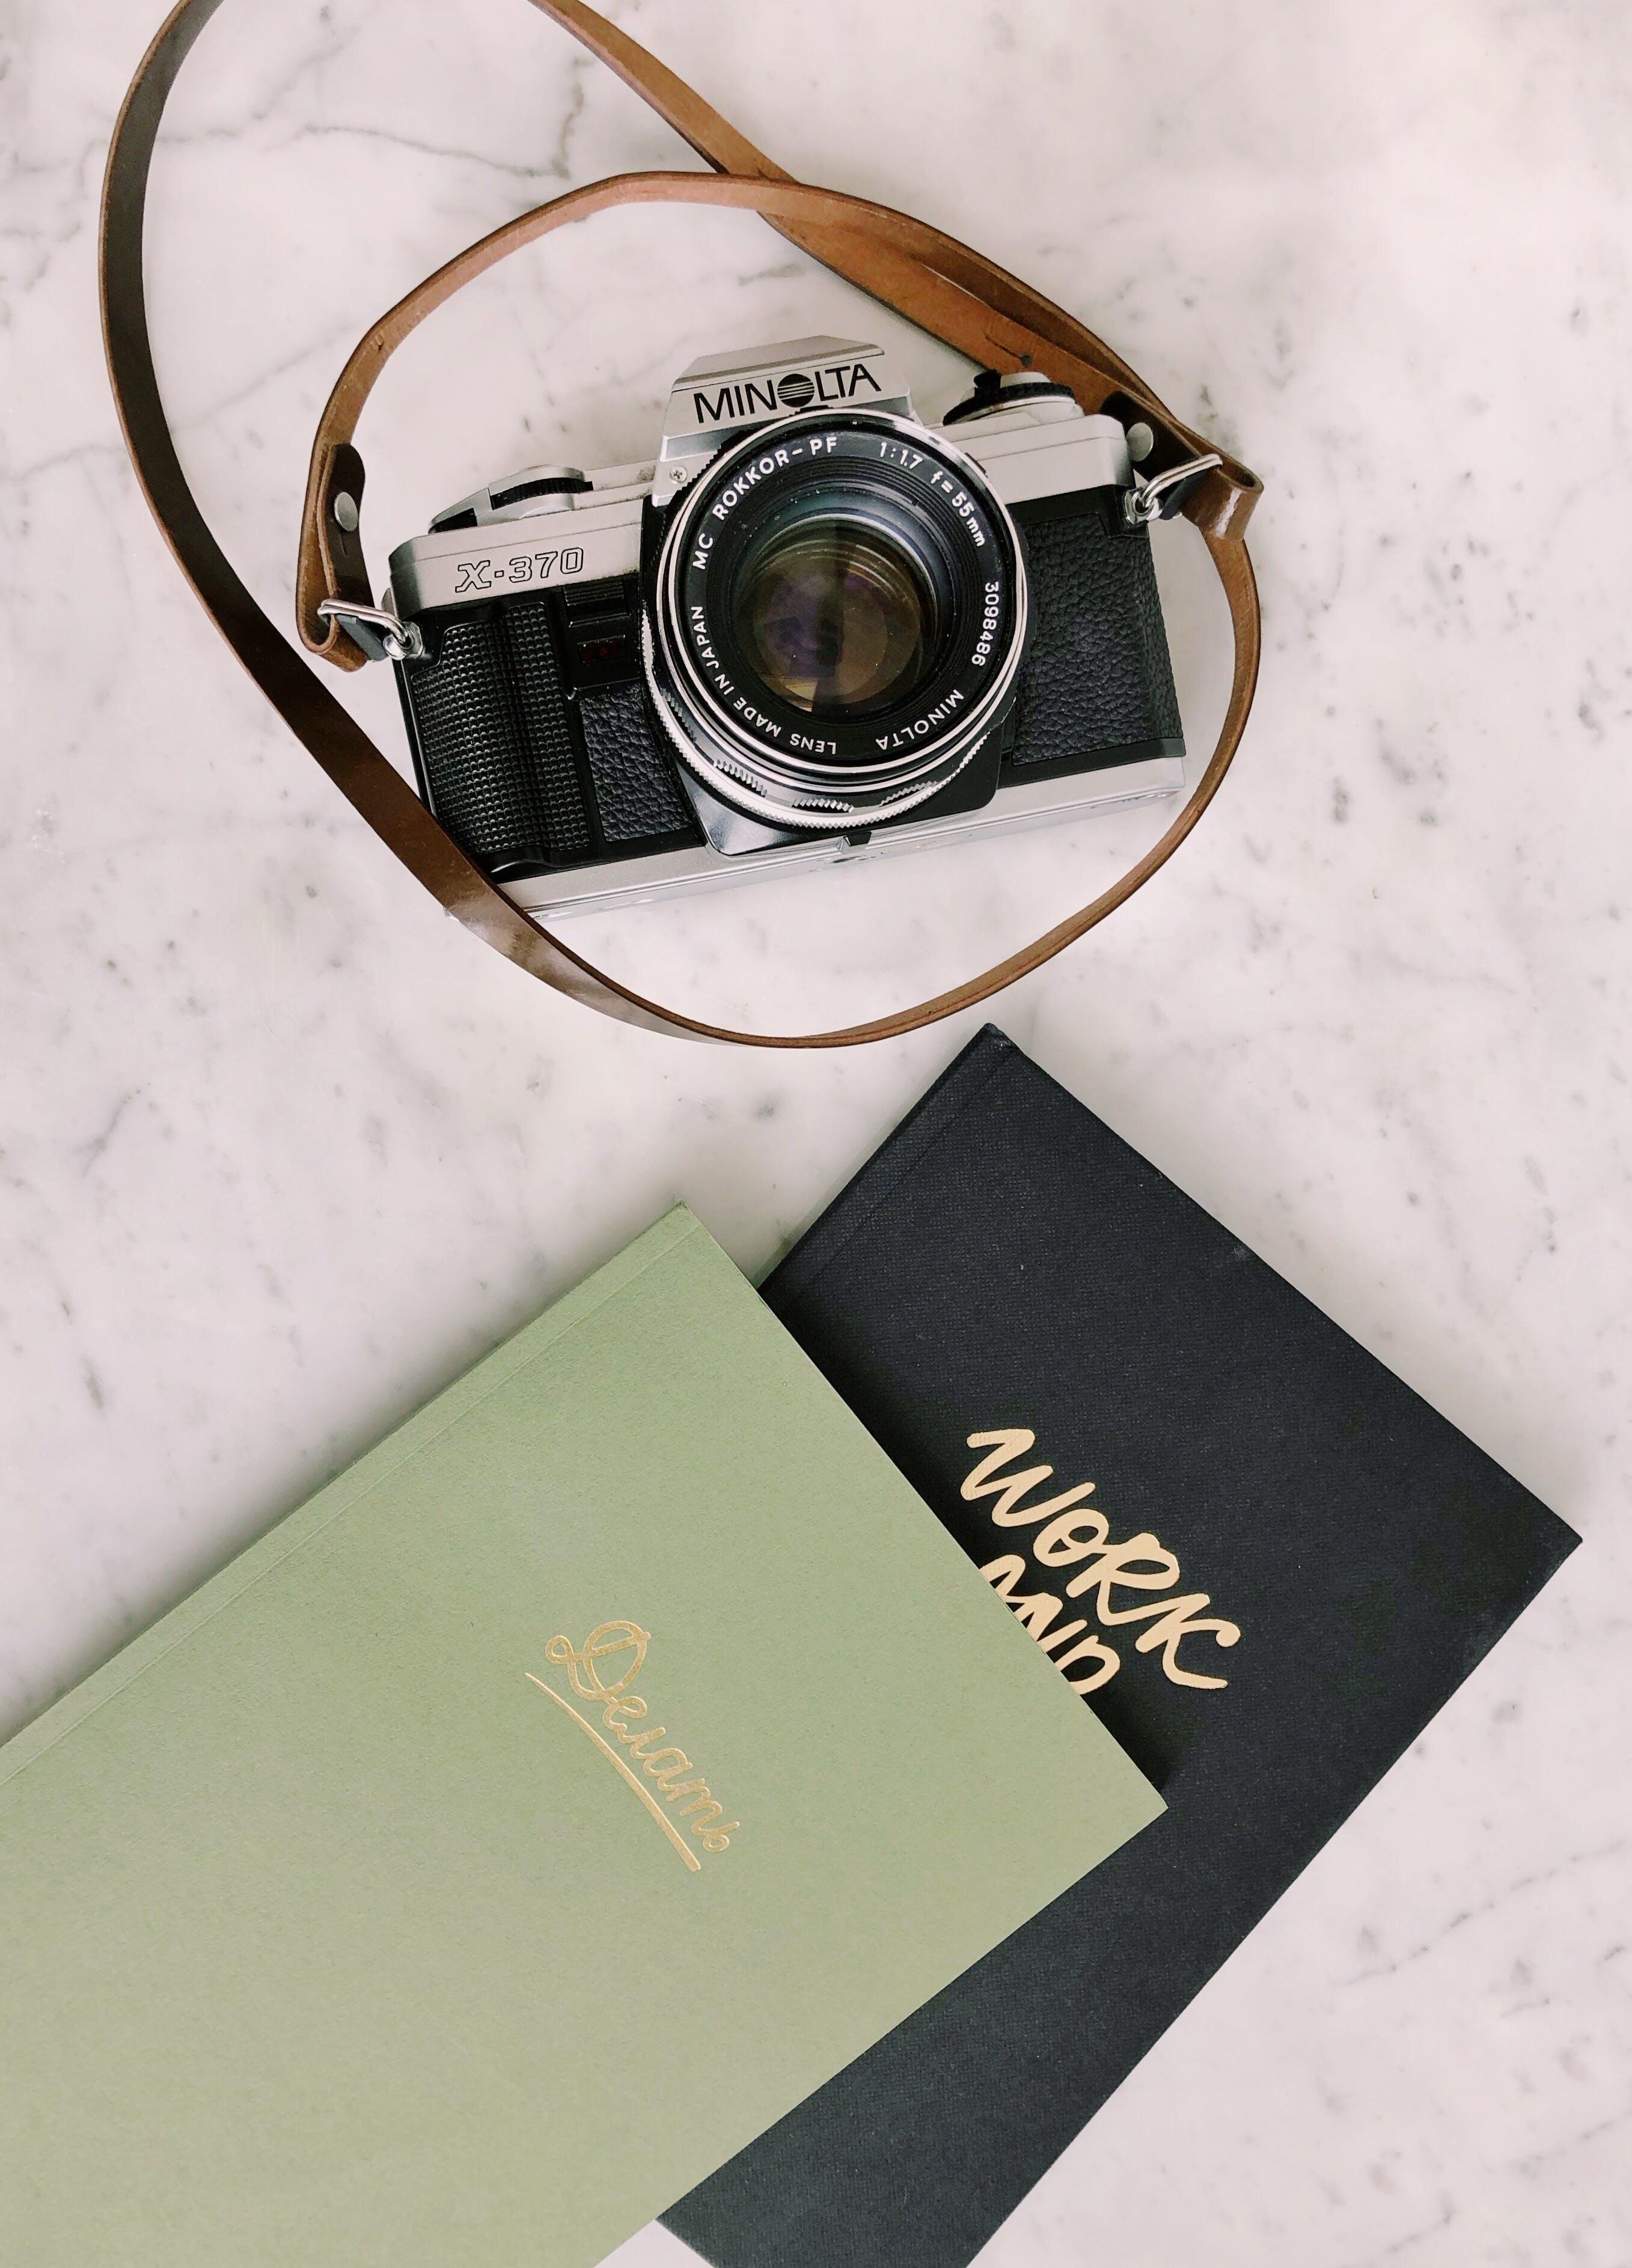 Black and Gray Minolta Milc Camera